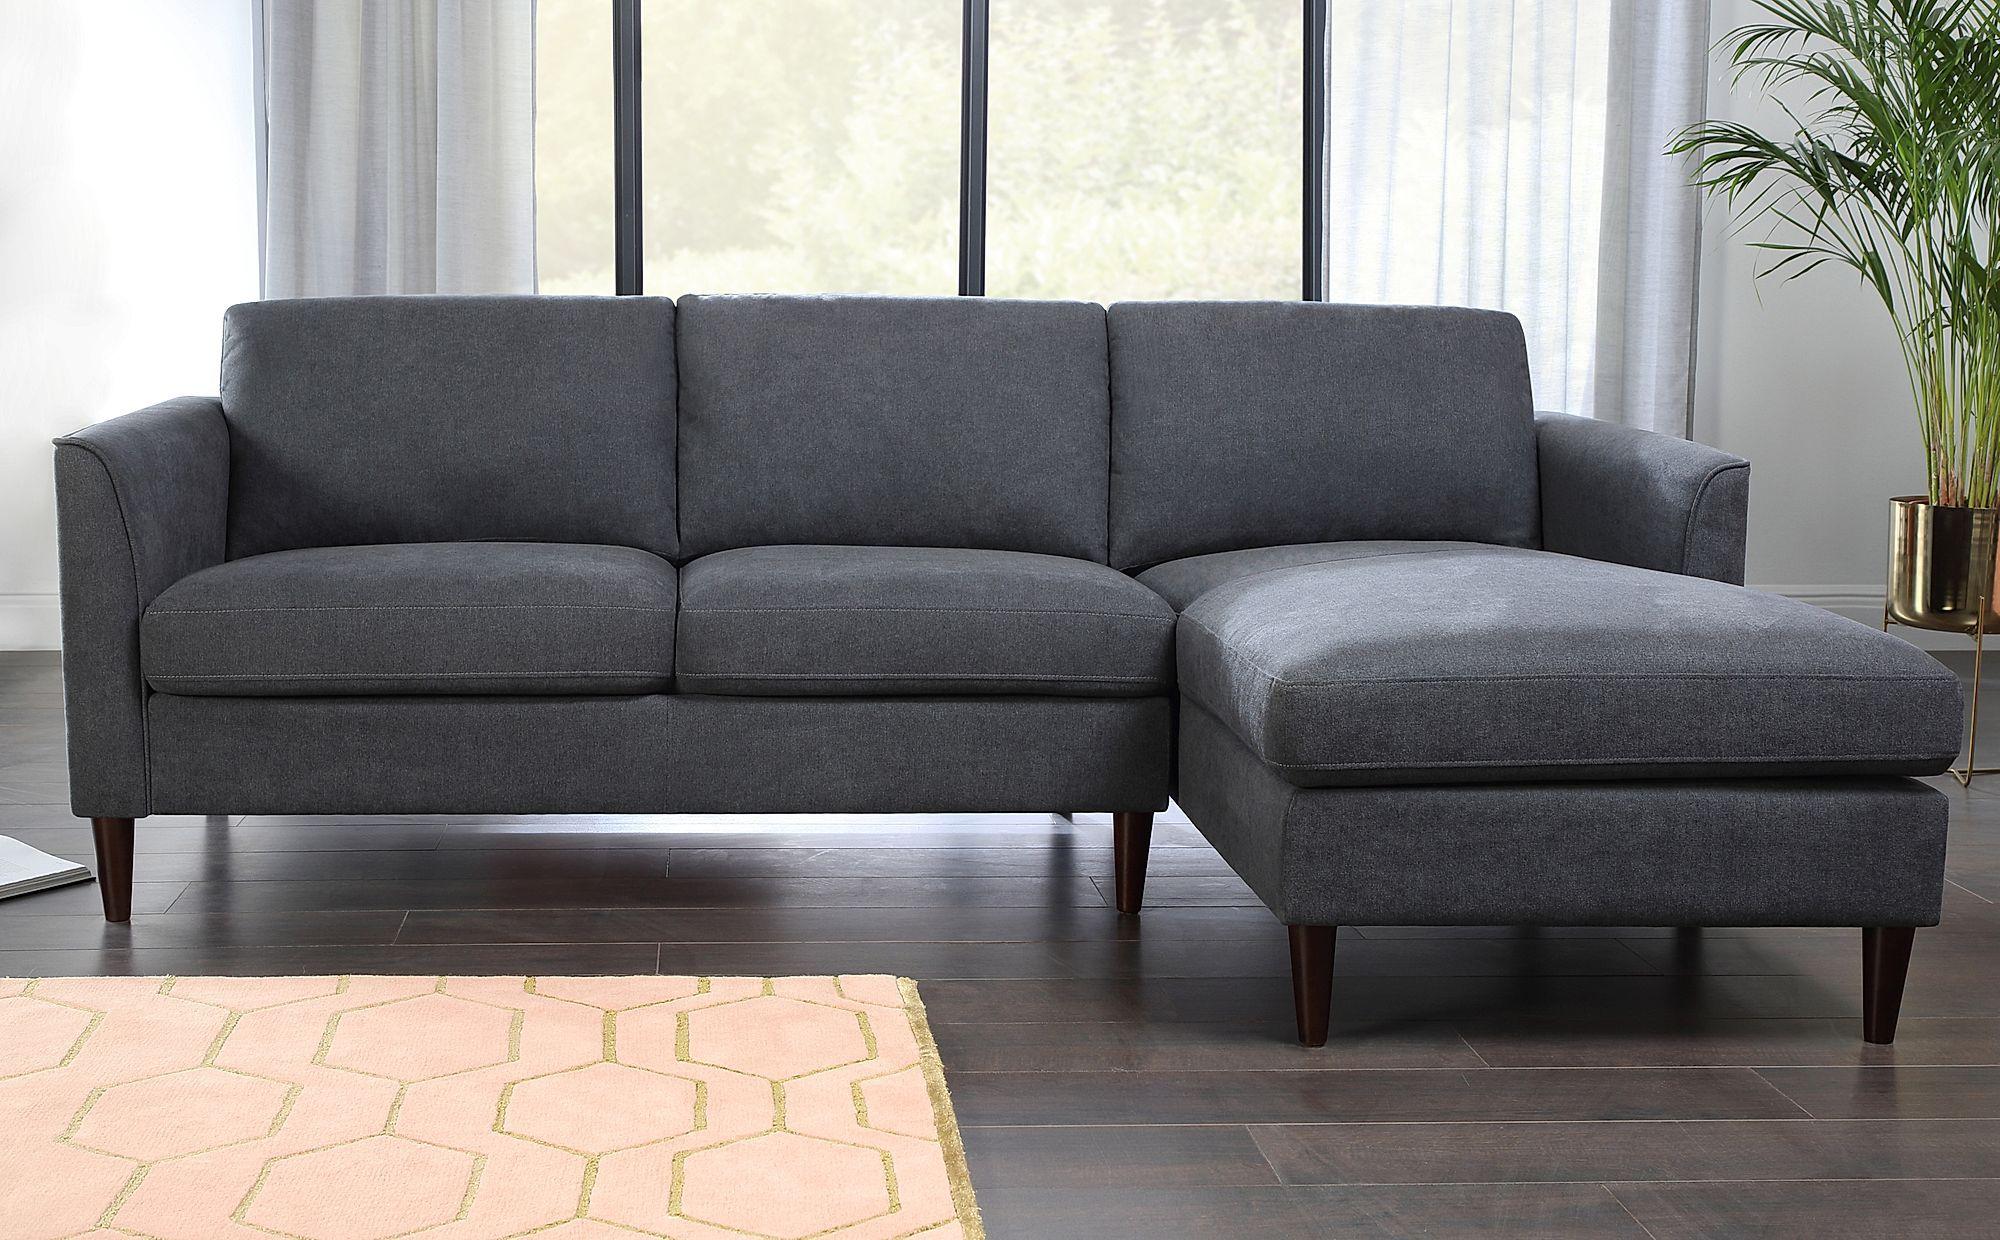 Hayward Slate Grey Plush Fabric L Shape Corner Sofa Rhf Furniture Choice In 2020 Corner Sofa Furniture Choice L Shaped Couch